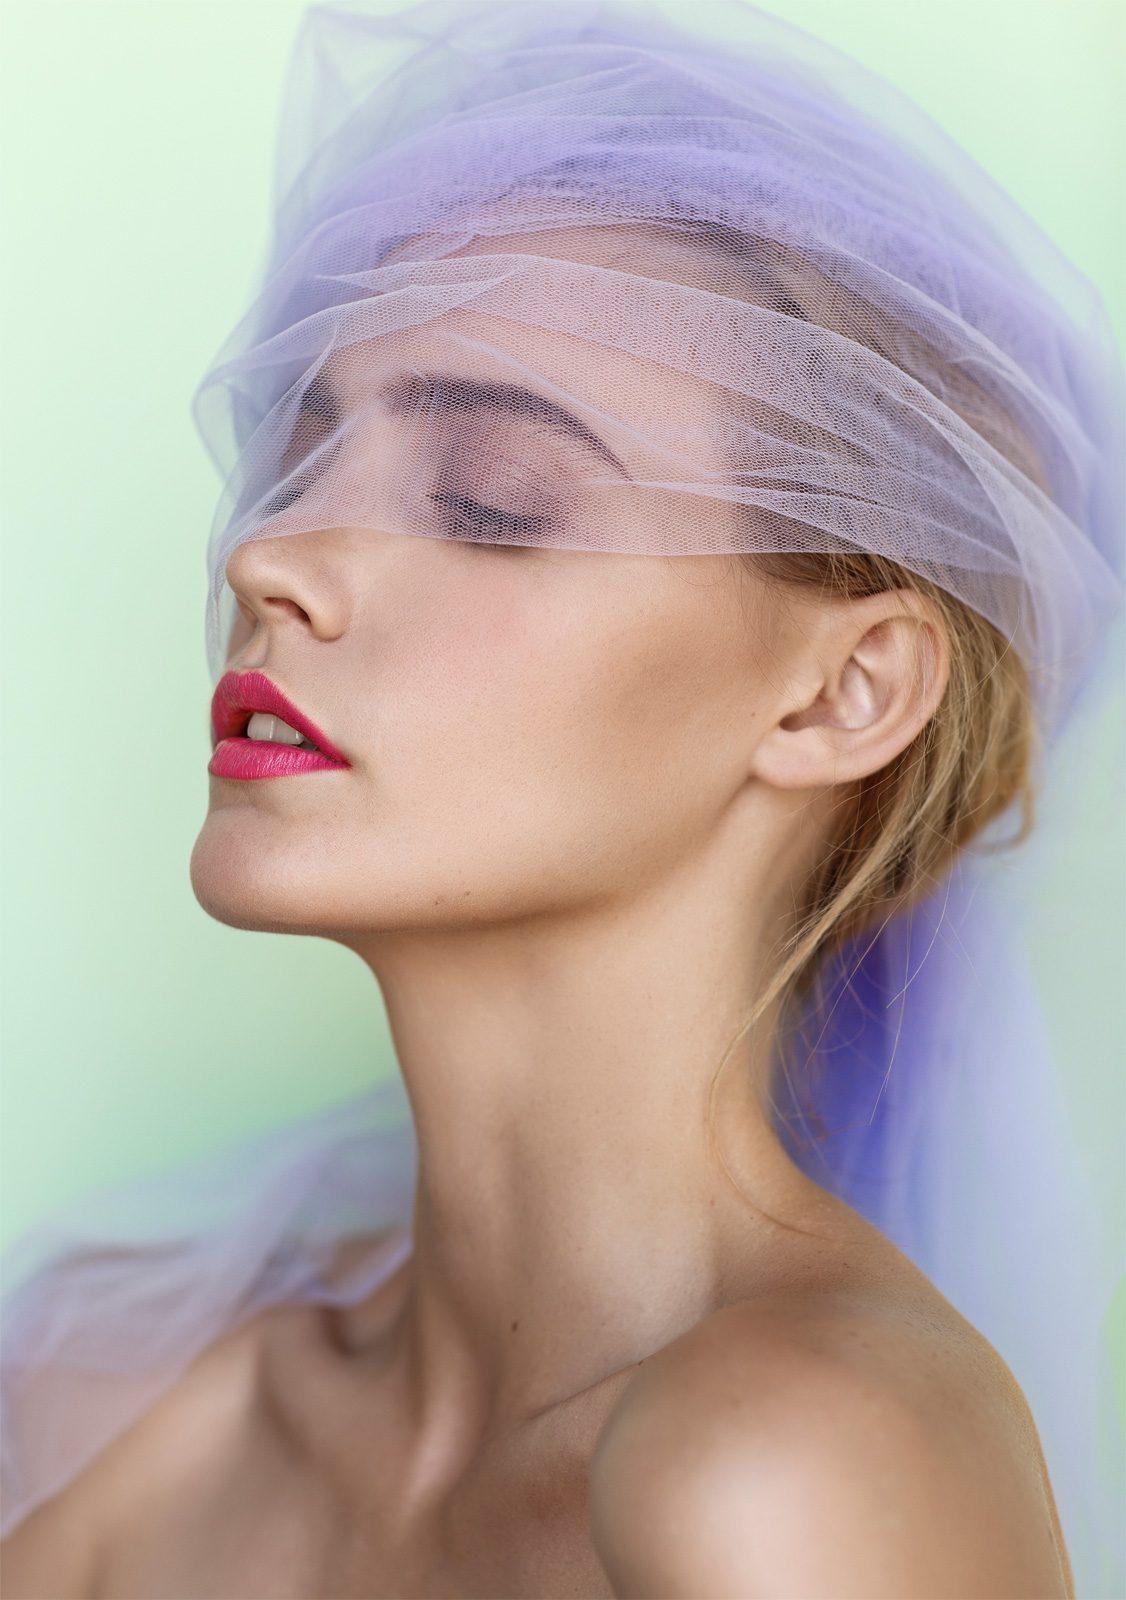 Vaughan Treyvellan Photographers    // lionsmag.com - premium nude photography magazine